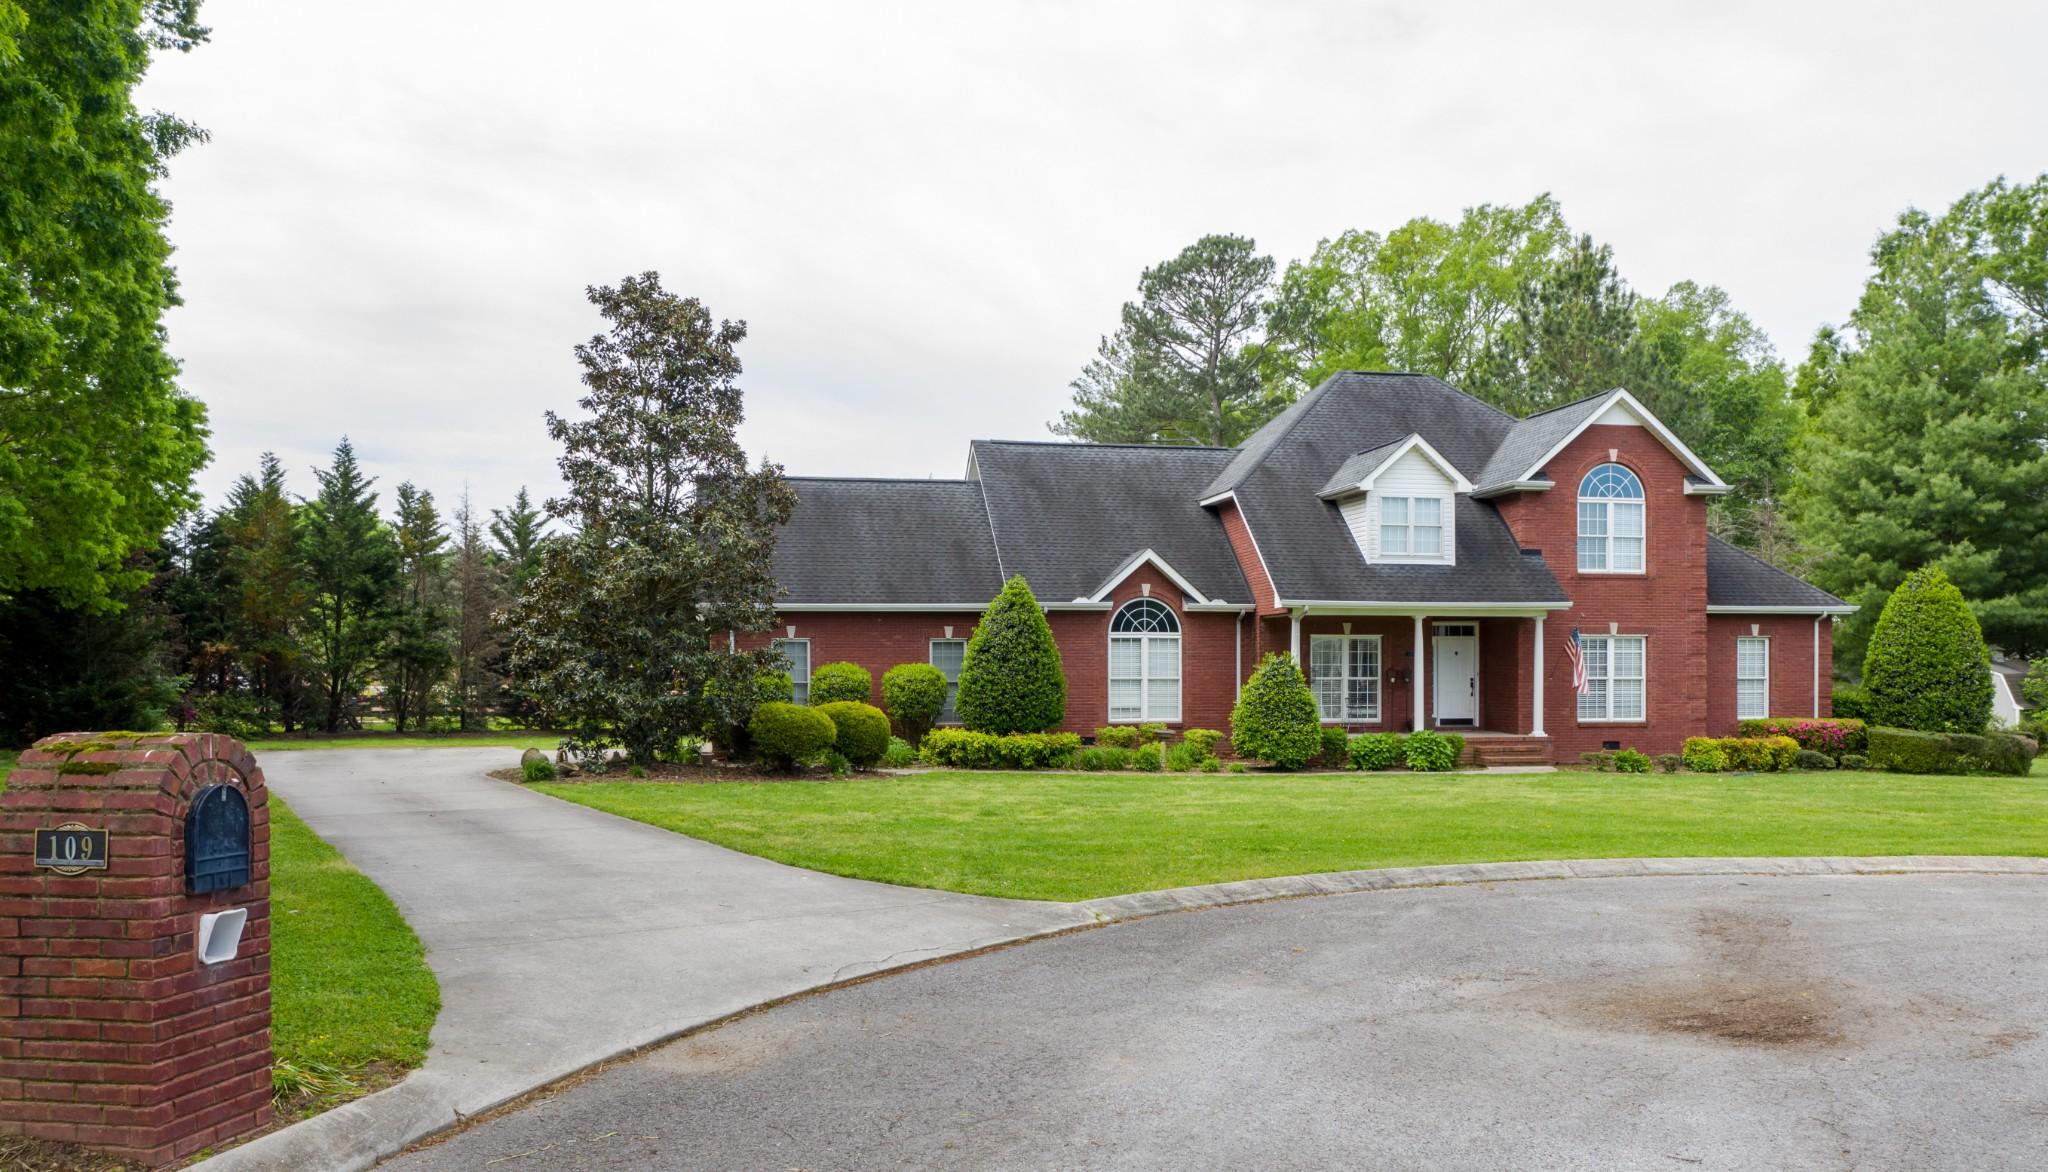 109 ROYAL CT, Tullahoma, TN 37388 - Tullahoma, TN real estate listing